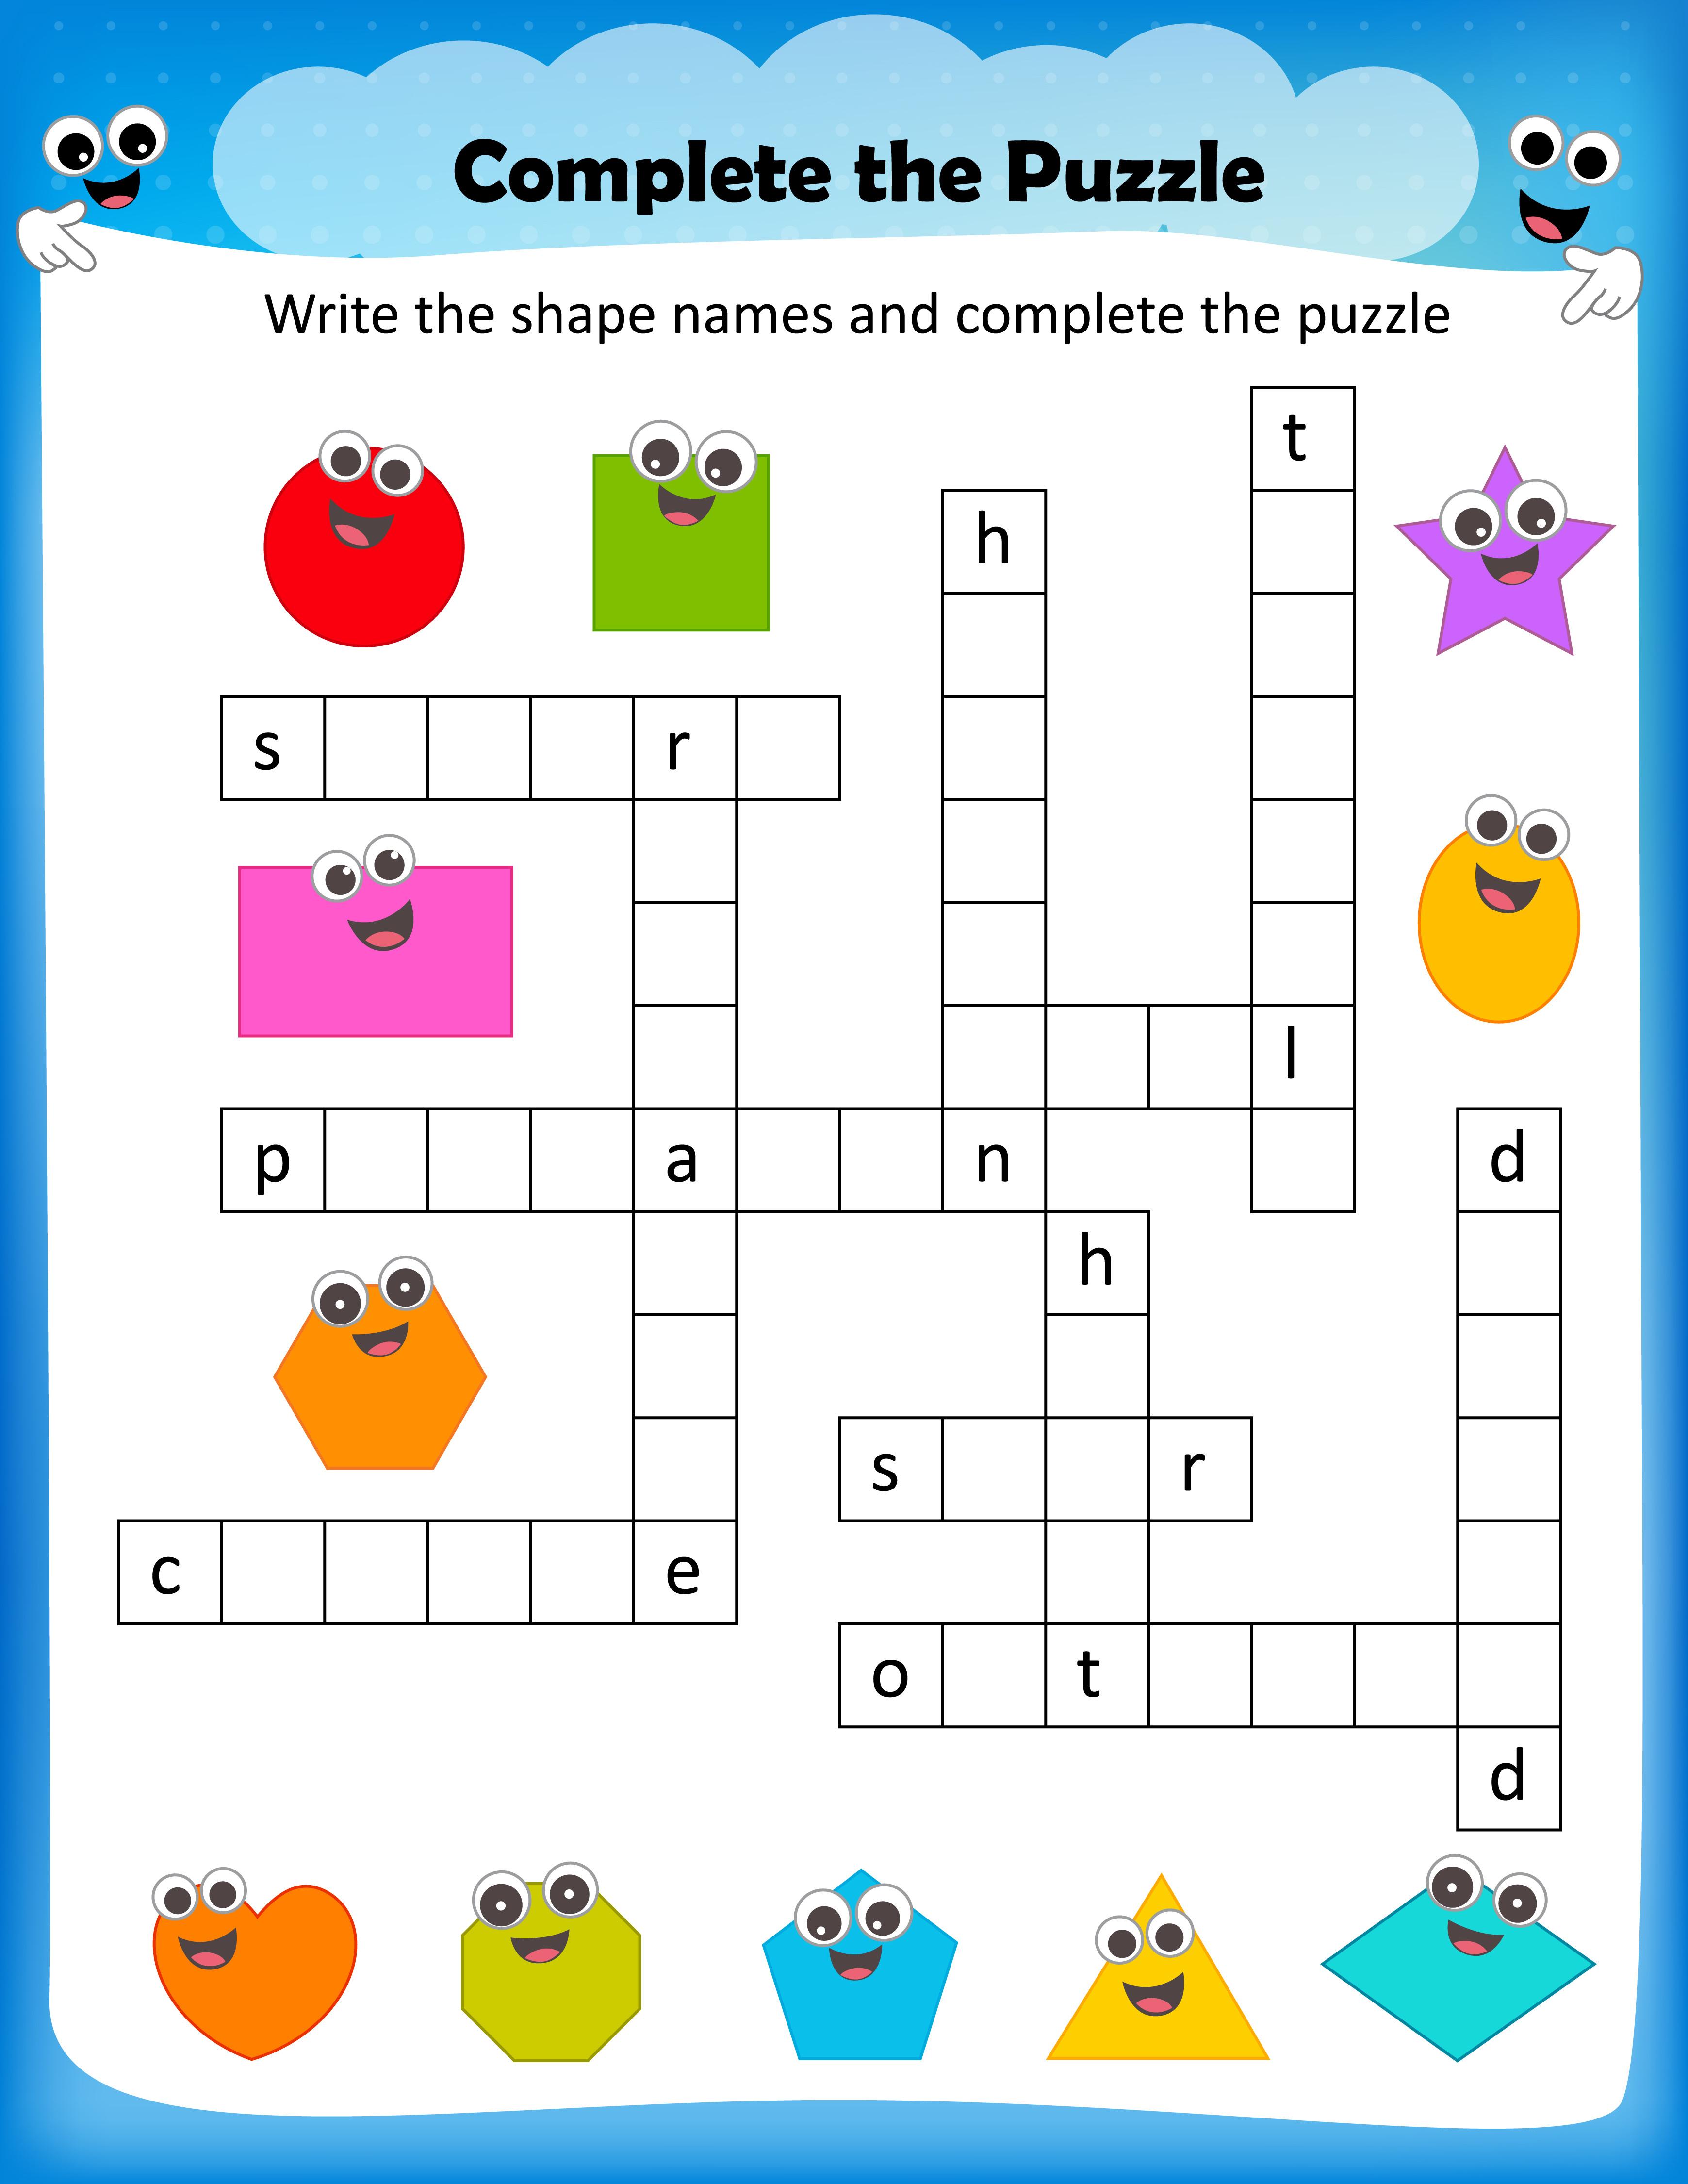 Free Printable Crosswords With Top 10 Benefits For Our Kids - Free Printable Recovery Crossword Puzzles